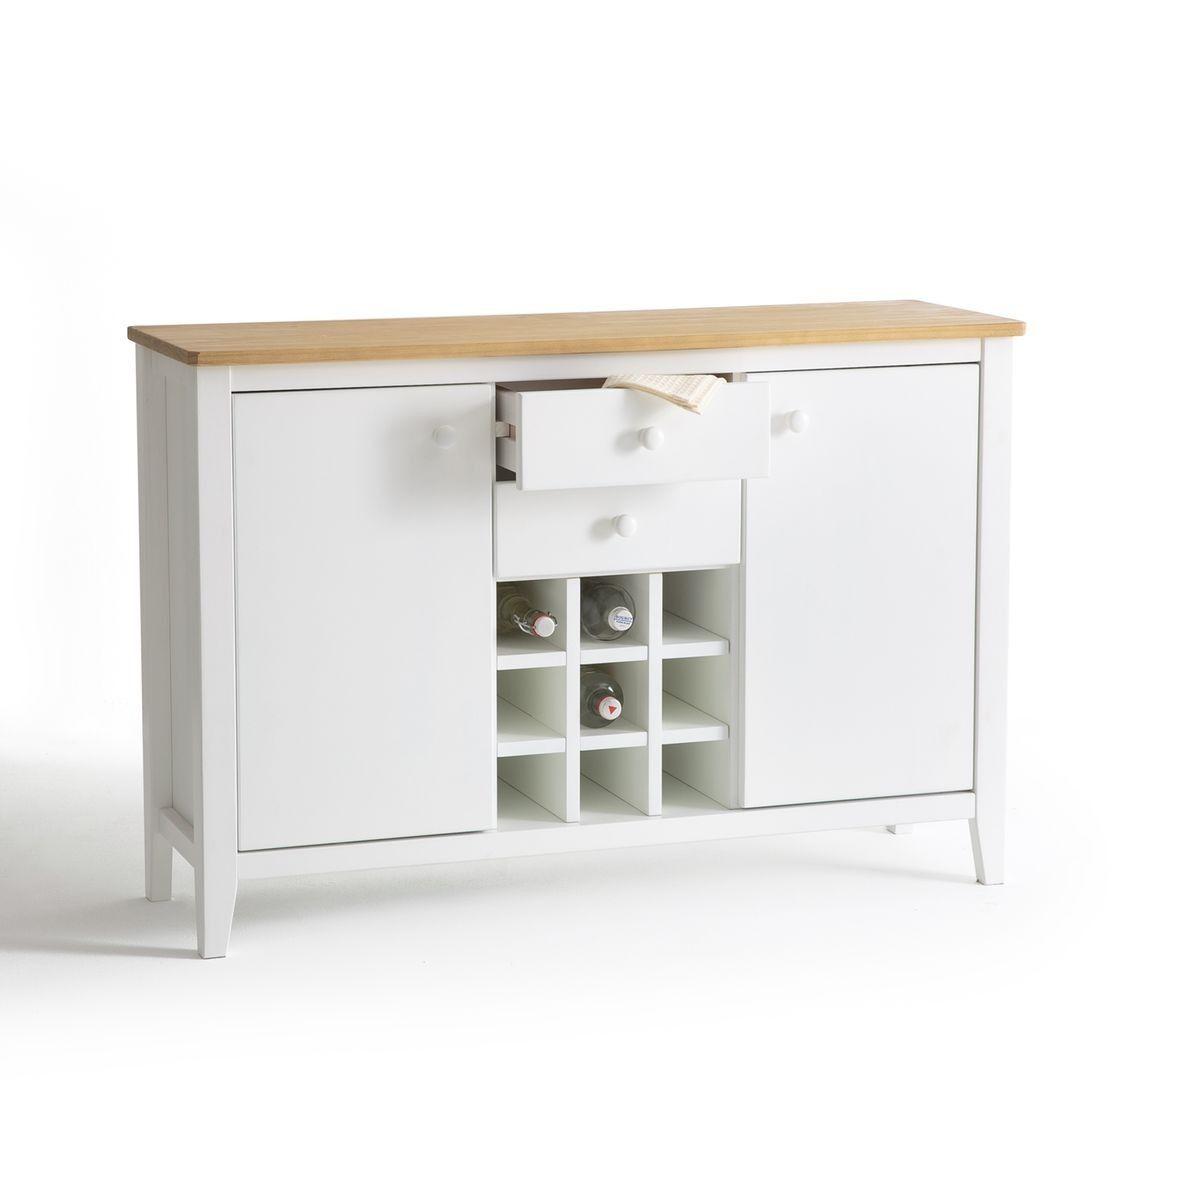 buffet de cuisine pin massif alvina blanc la redoute interieurs. Black Bedroom Furniture Sets. Home Design Ideas